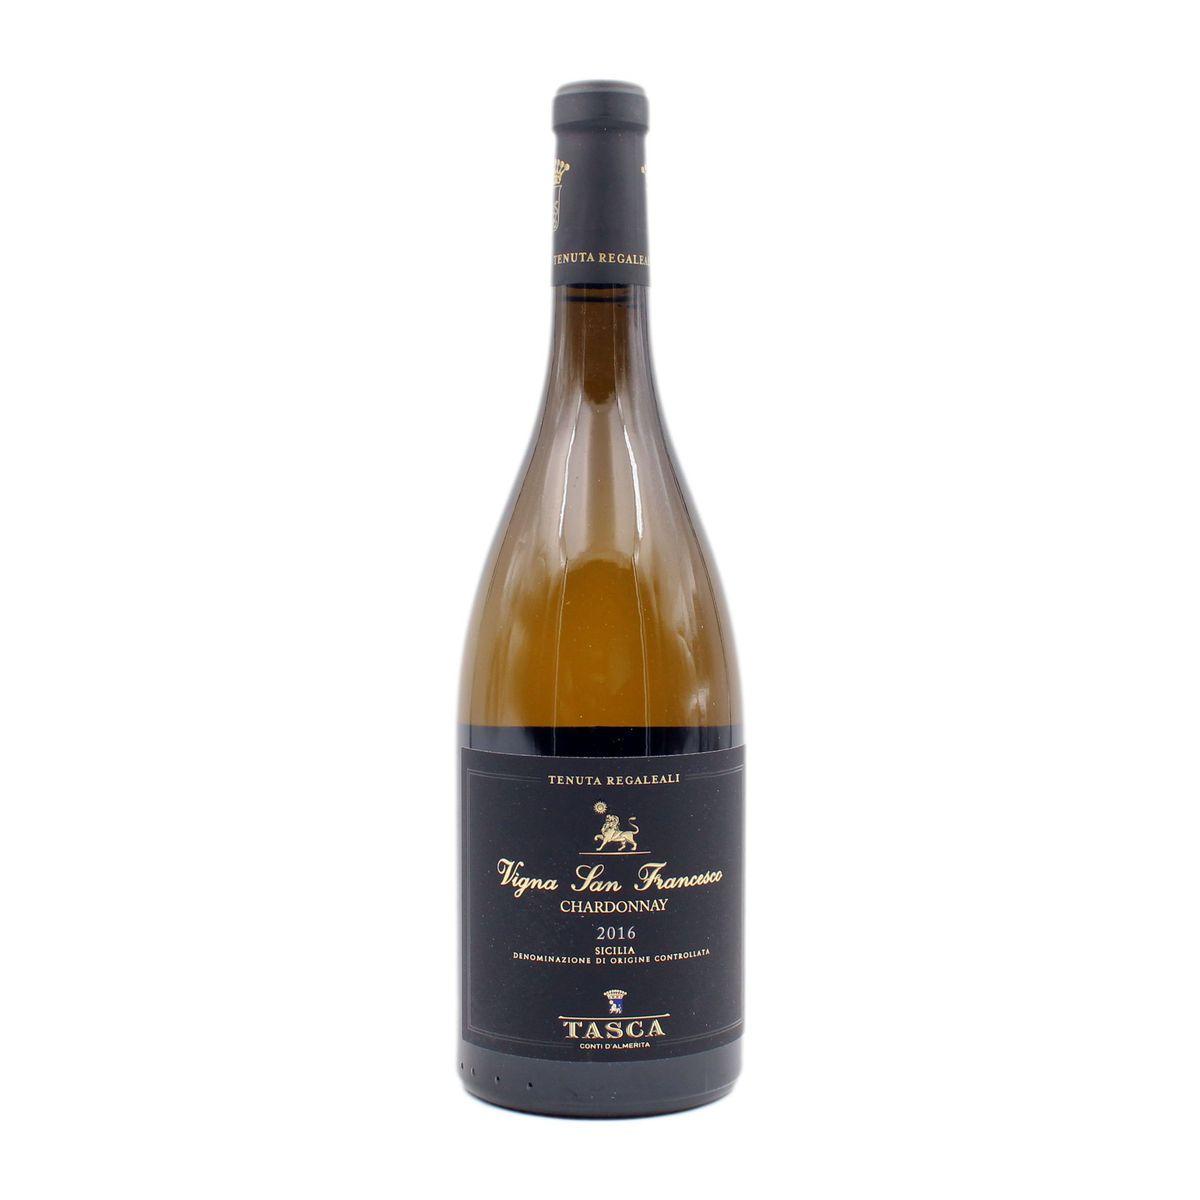 Chardonnay Vigna San Francesco 2016 Tasca D'Almerita